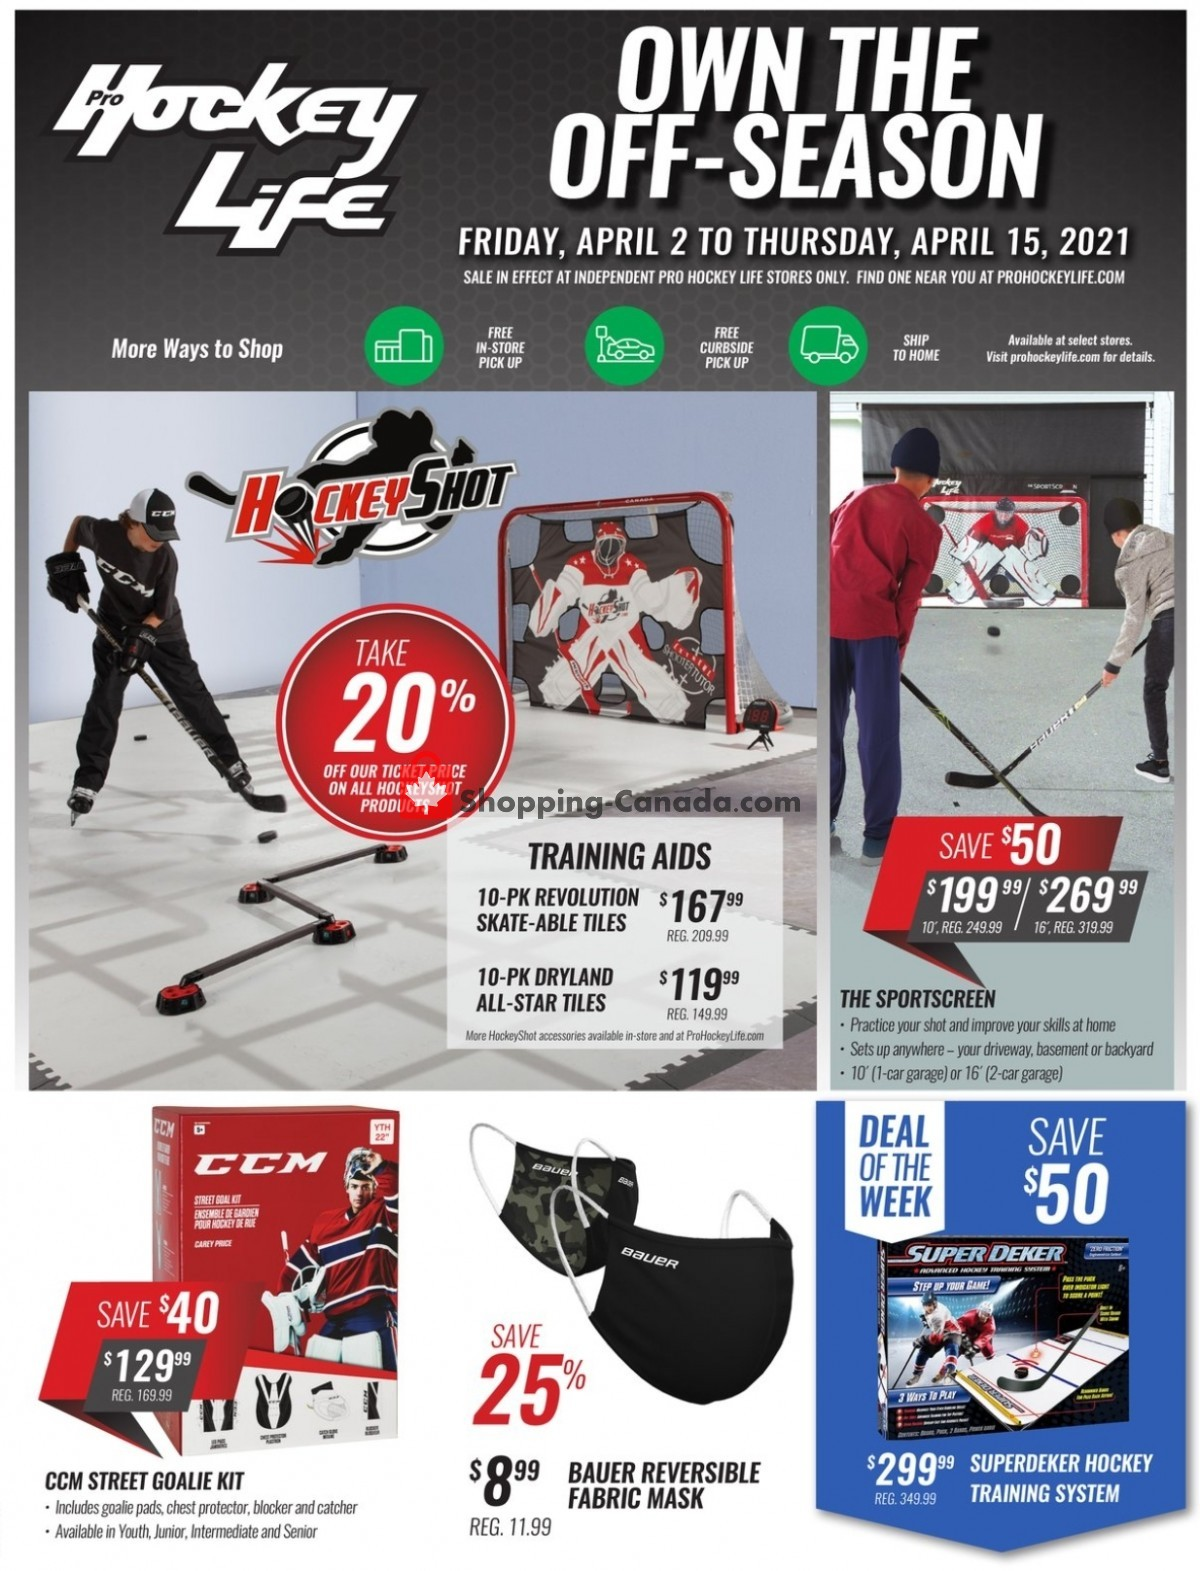 Flyer Pro Hockey Life Canada - from Friday April 2, 2021 to Thursday April 15, 2021